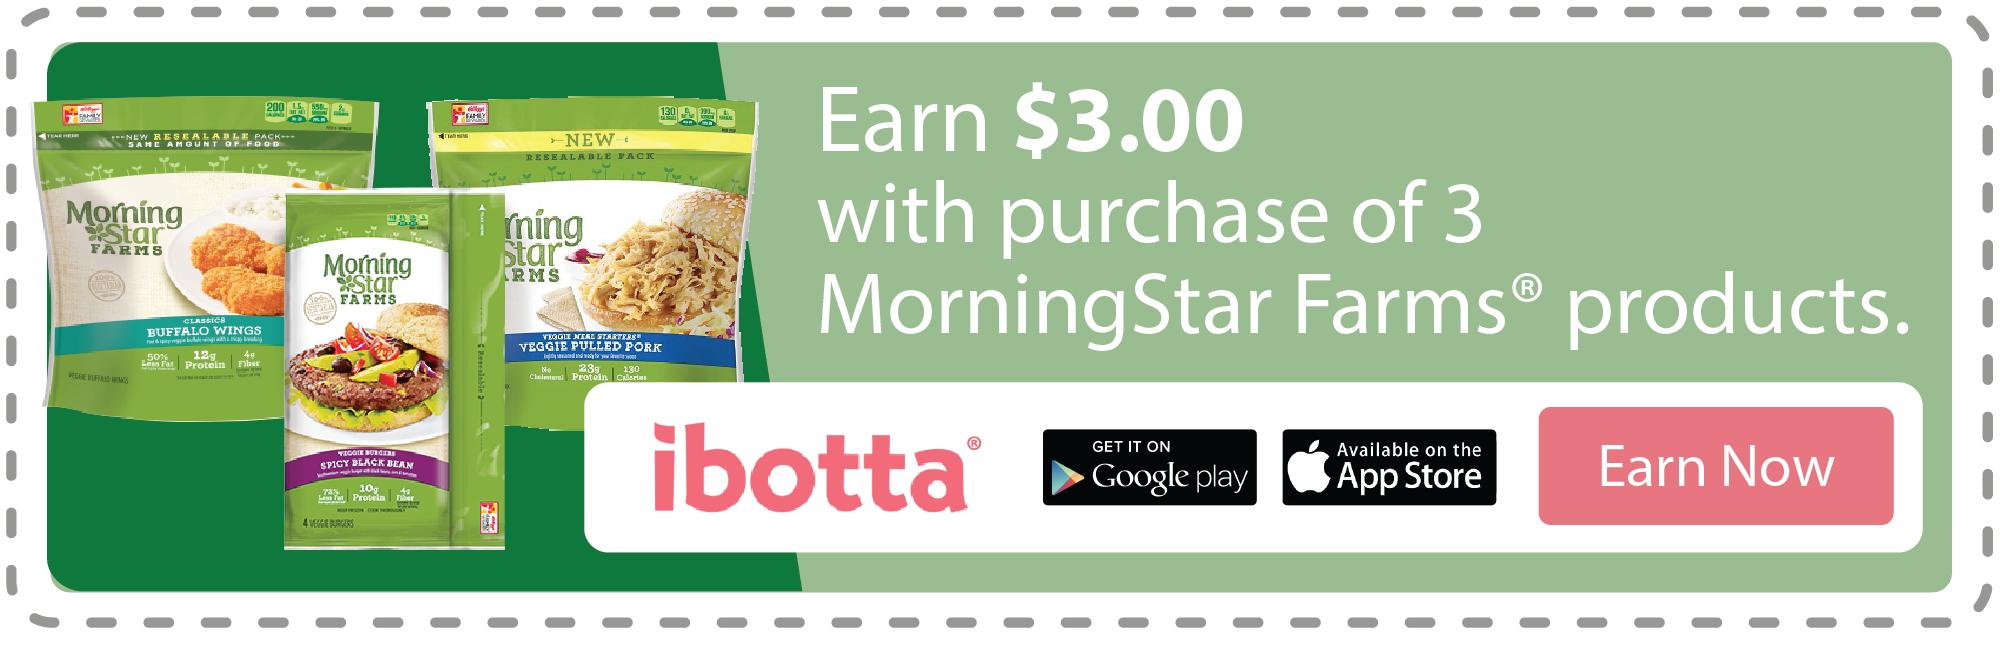 Ibotta coupon for Morning Star Farms